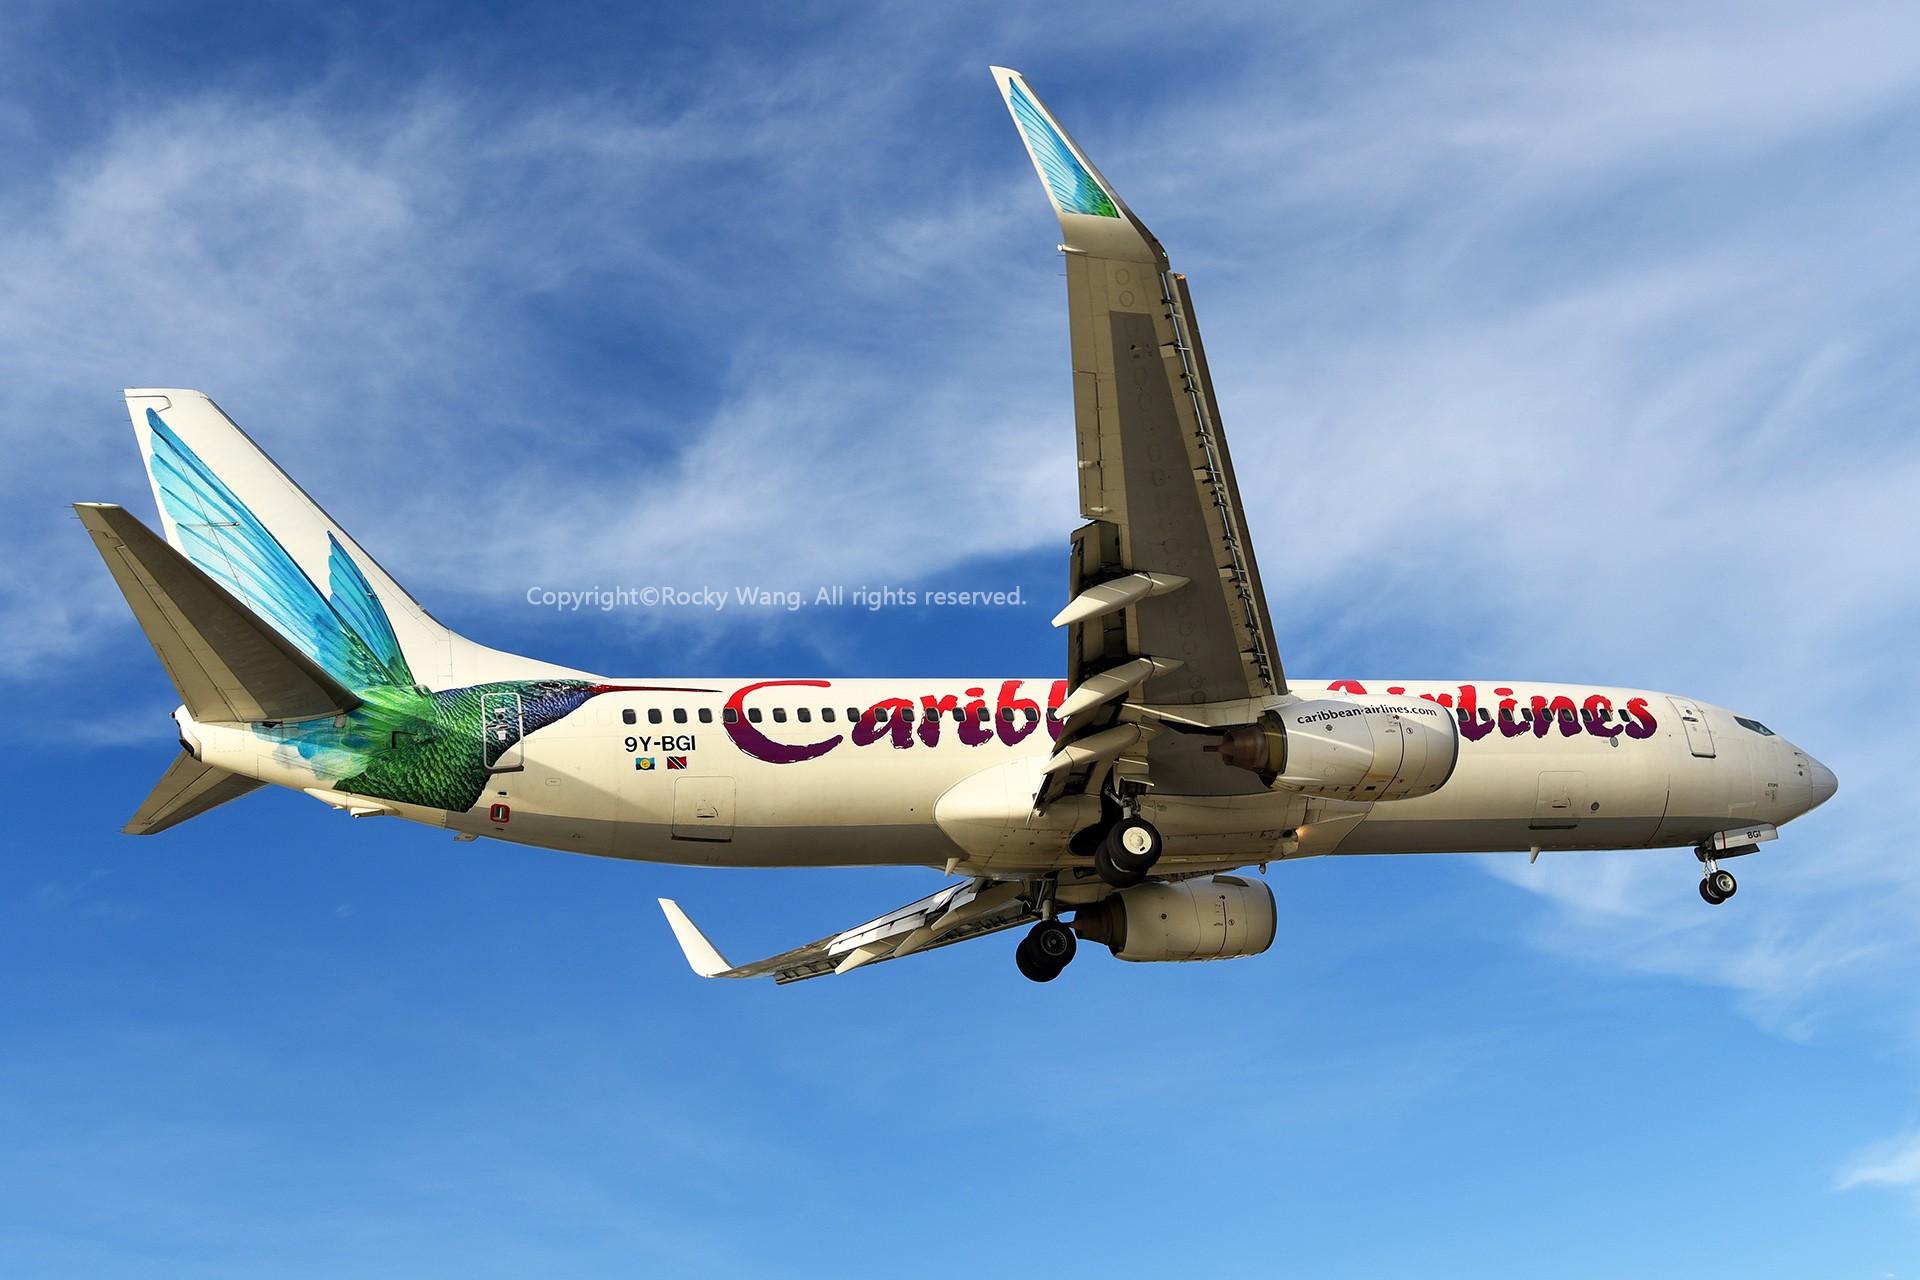 Re:[原创]My endless Caribbean dream——圣马丁朱莉安娜公主机场拍机记 BOEING 737-8Q8 9Y-BGI 荷属安的列斯群岛朱利安娜公主机场